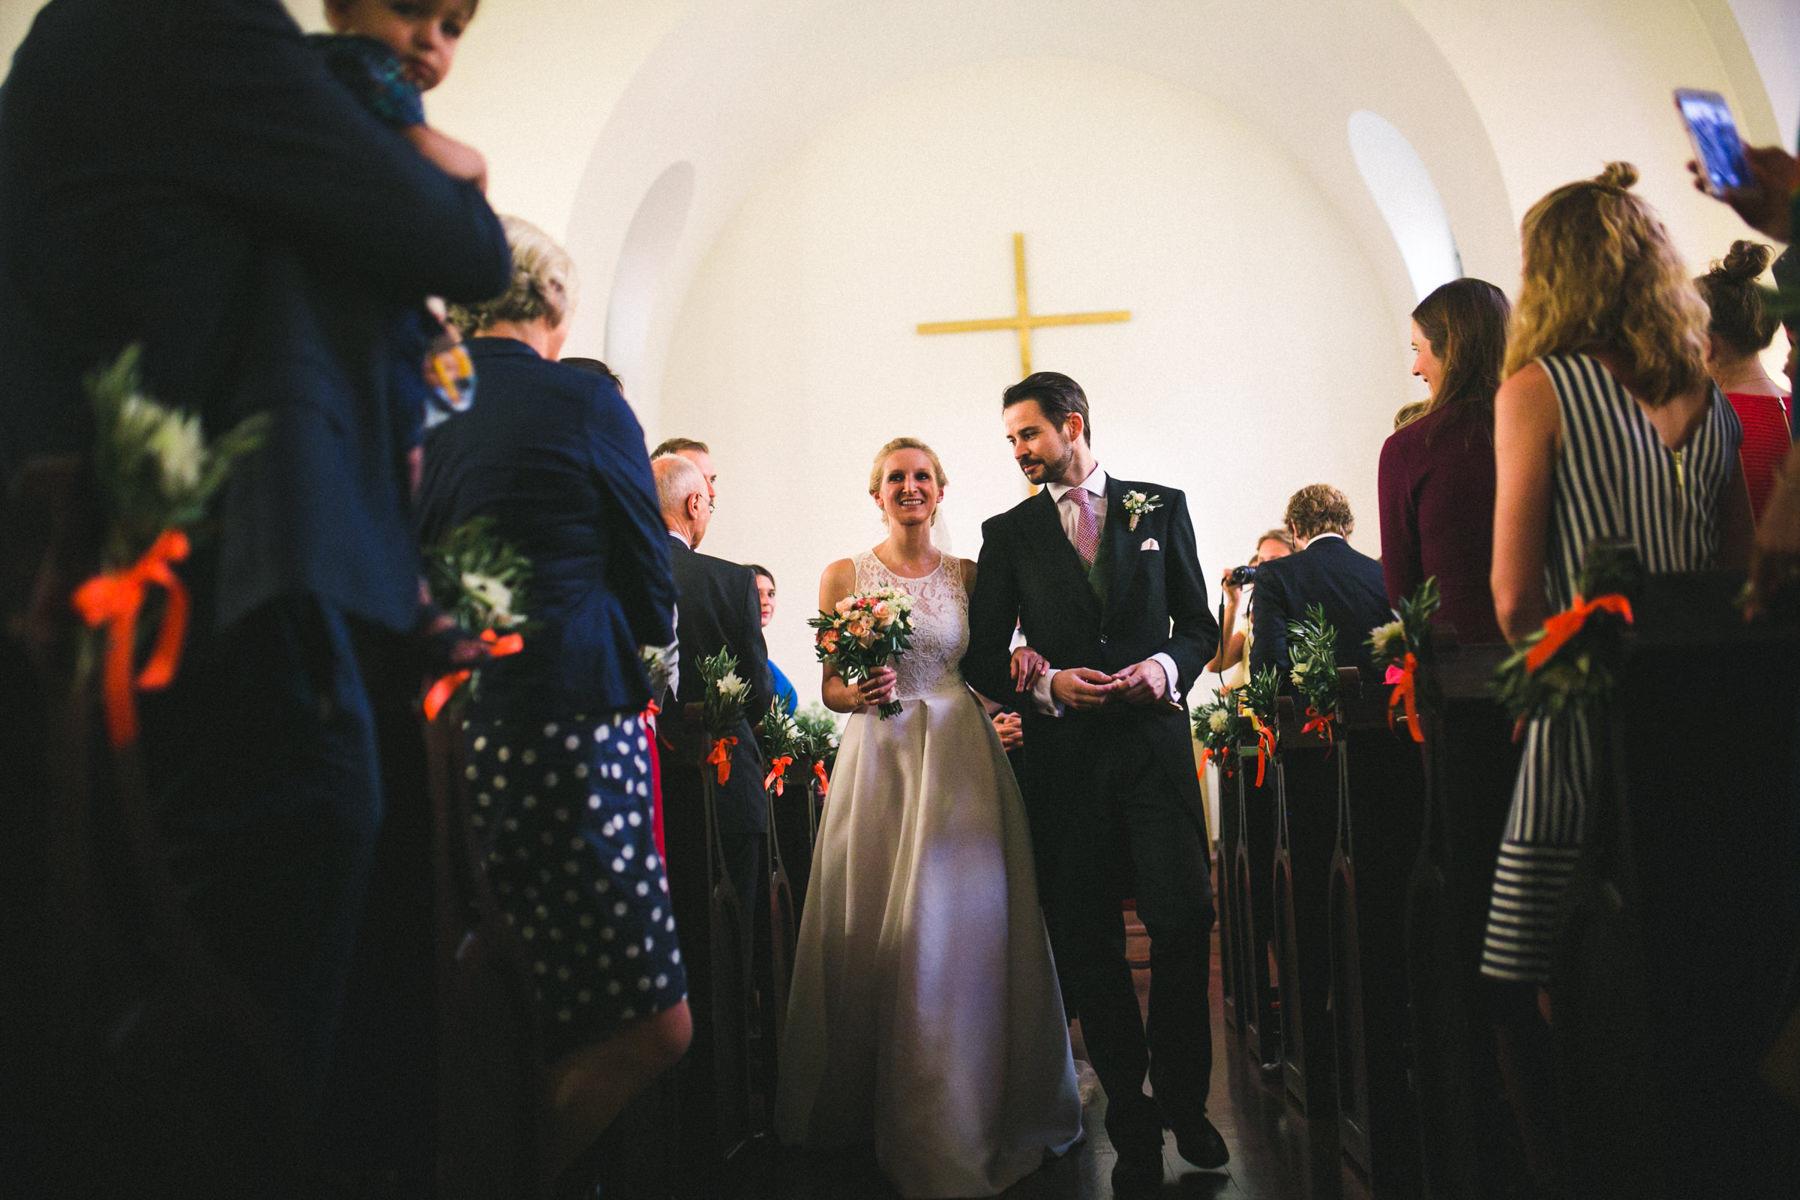 Wedding_Photography_Carlos_Hevia_Barcelona_Berlin_18.jpg